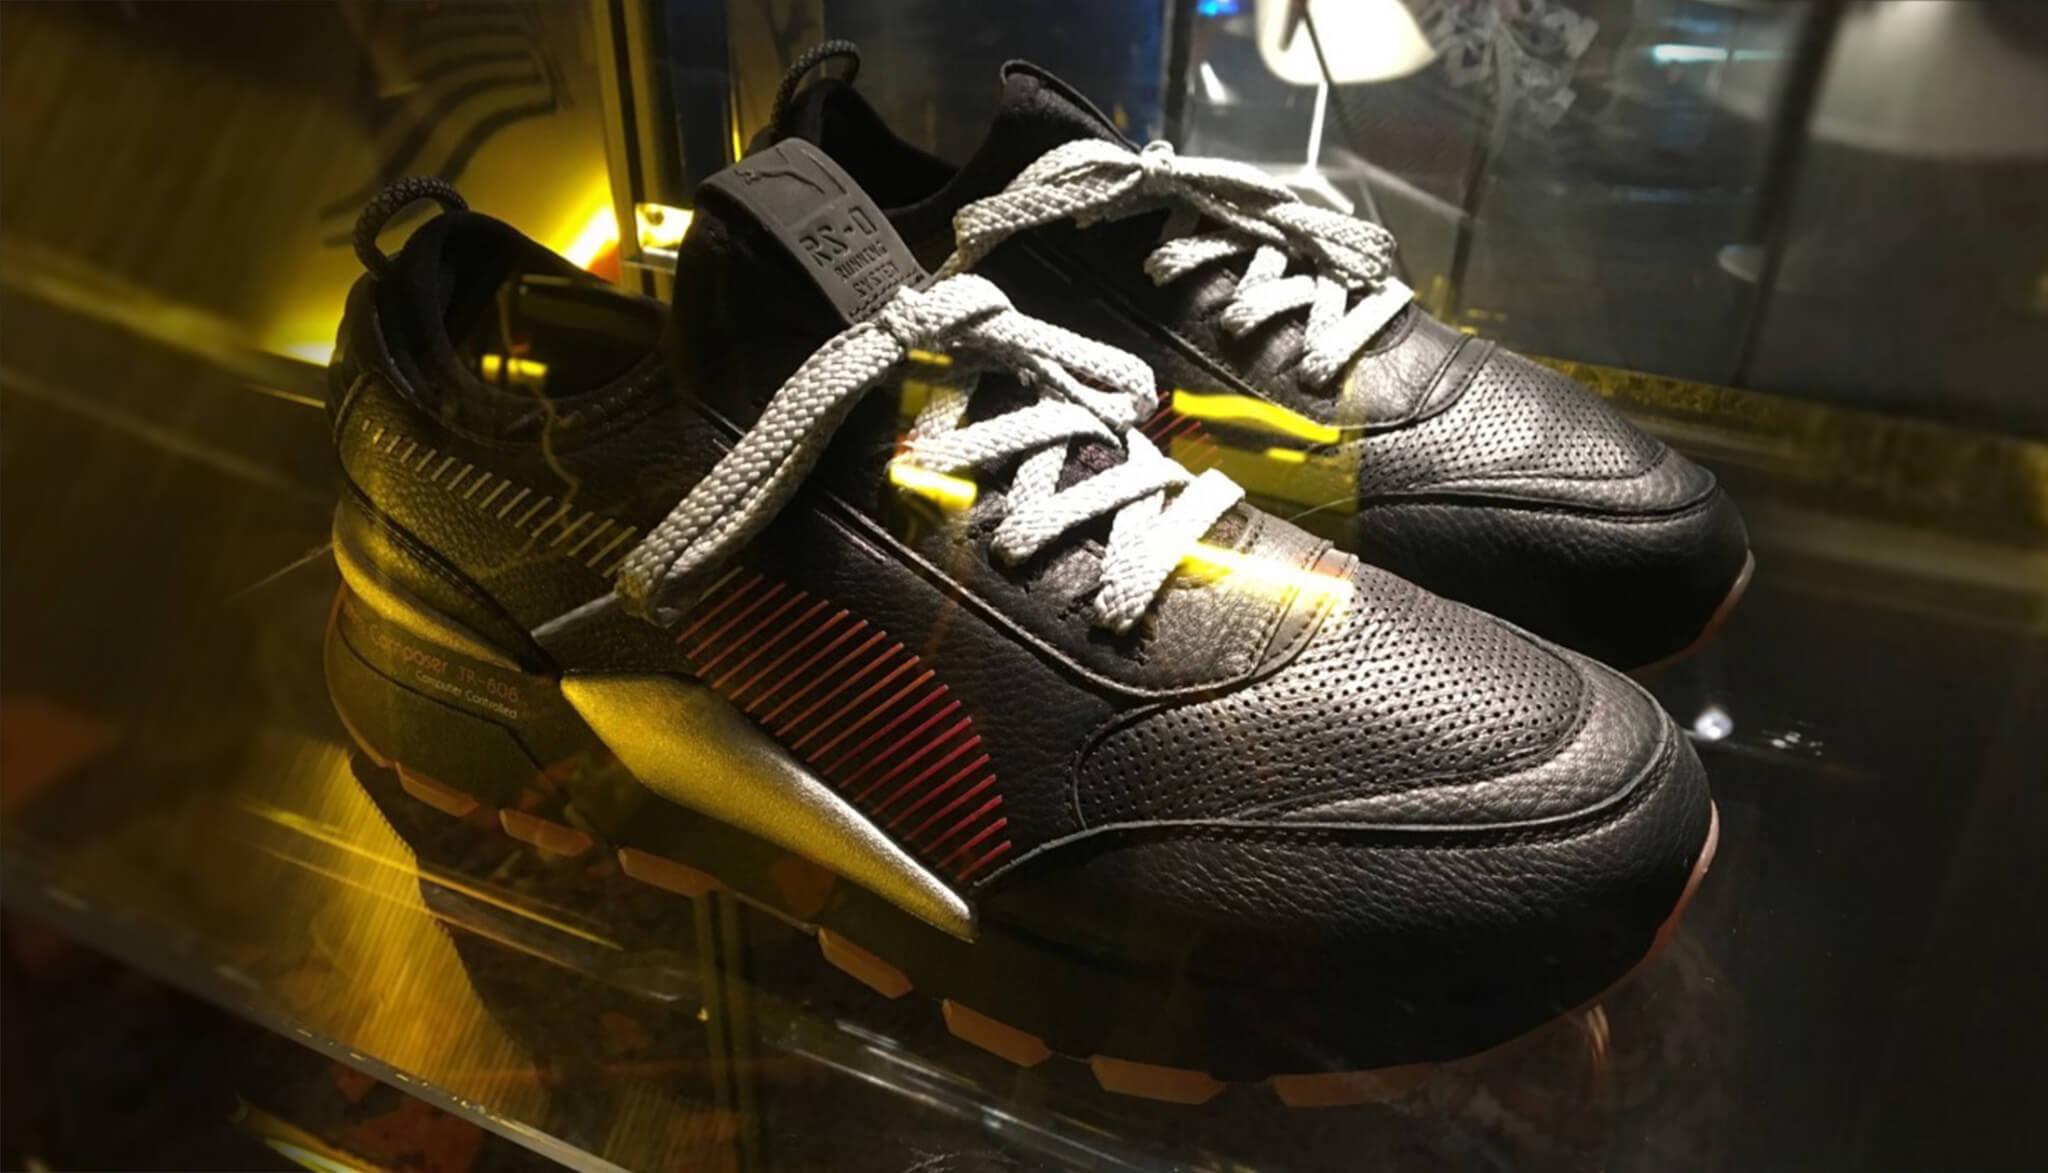 808 Puma shoes